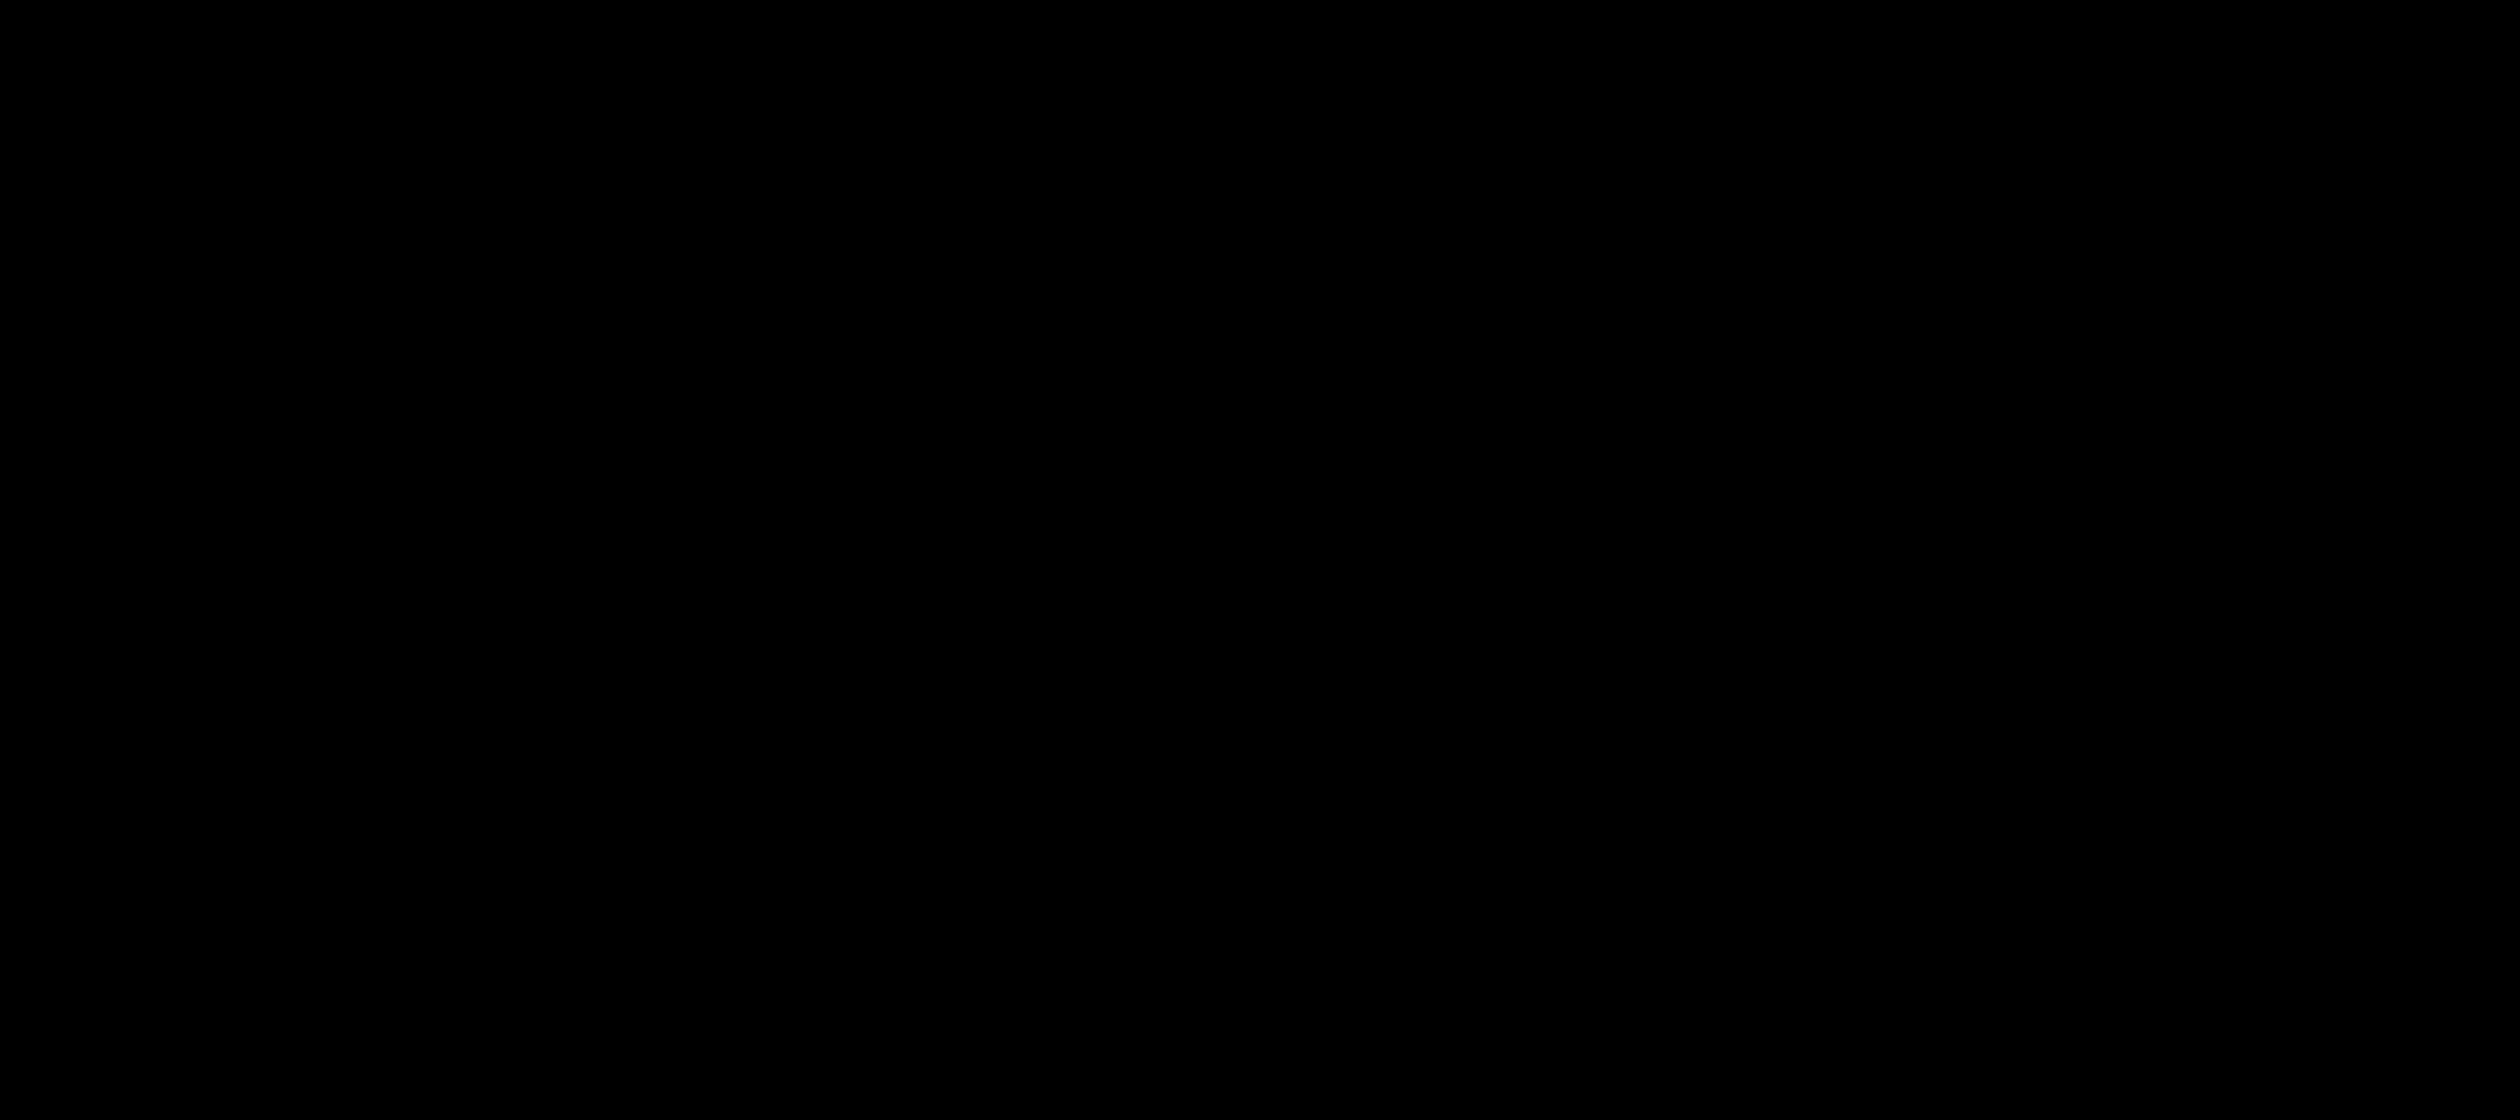 AFF_Novel_Serif_00